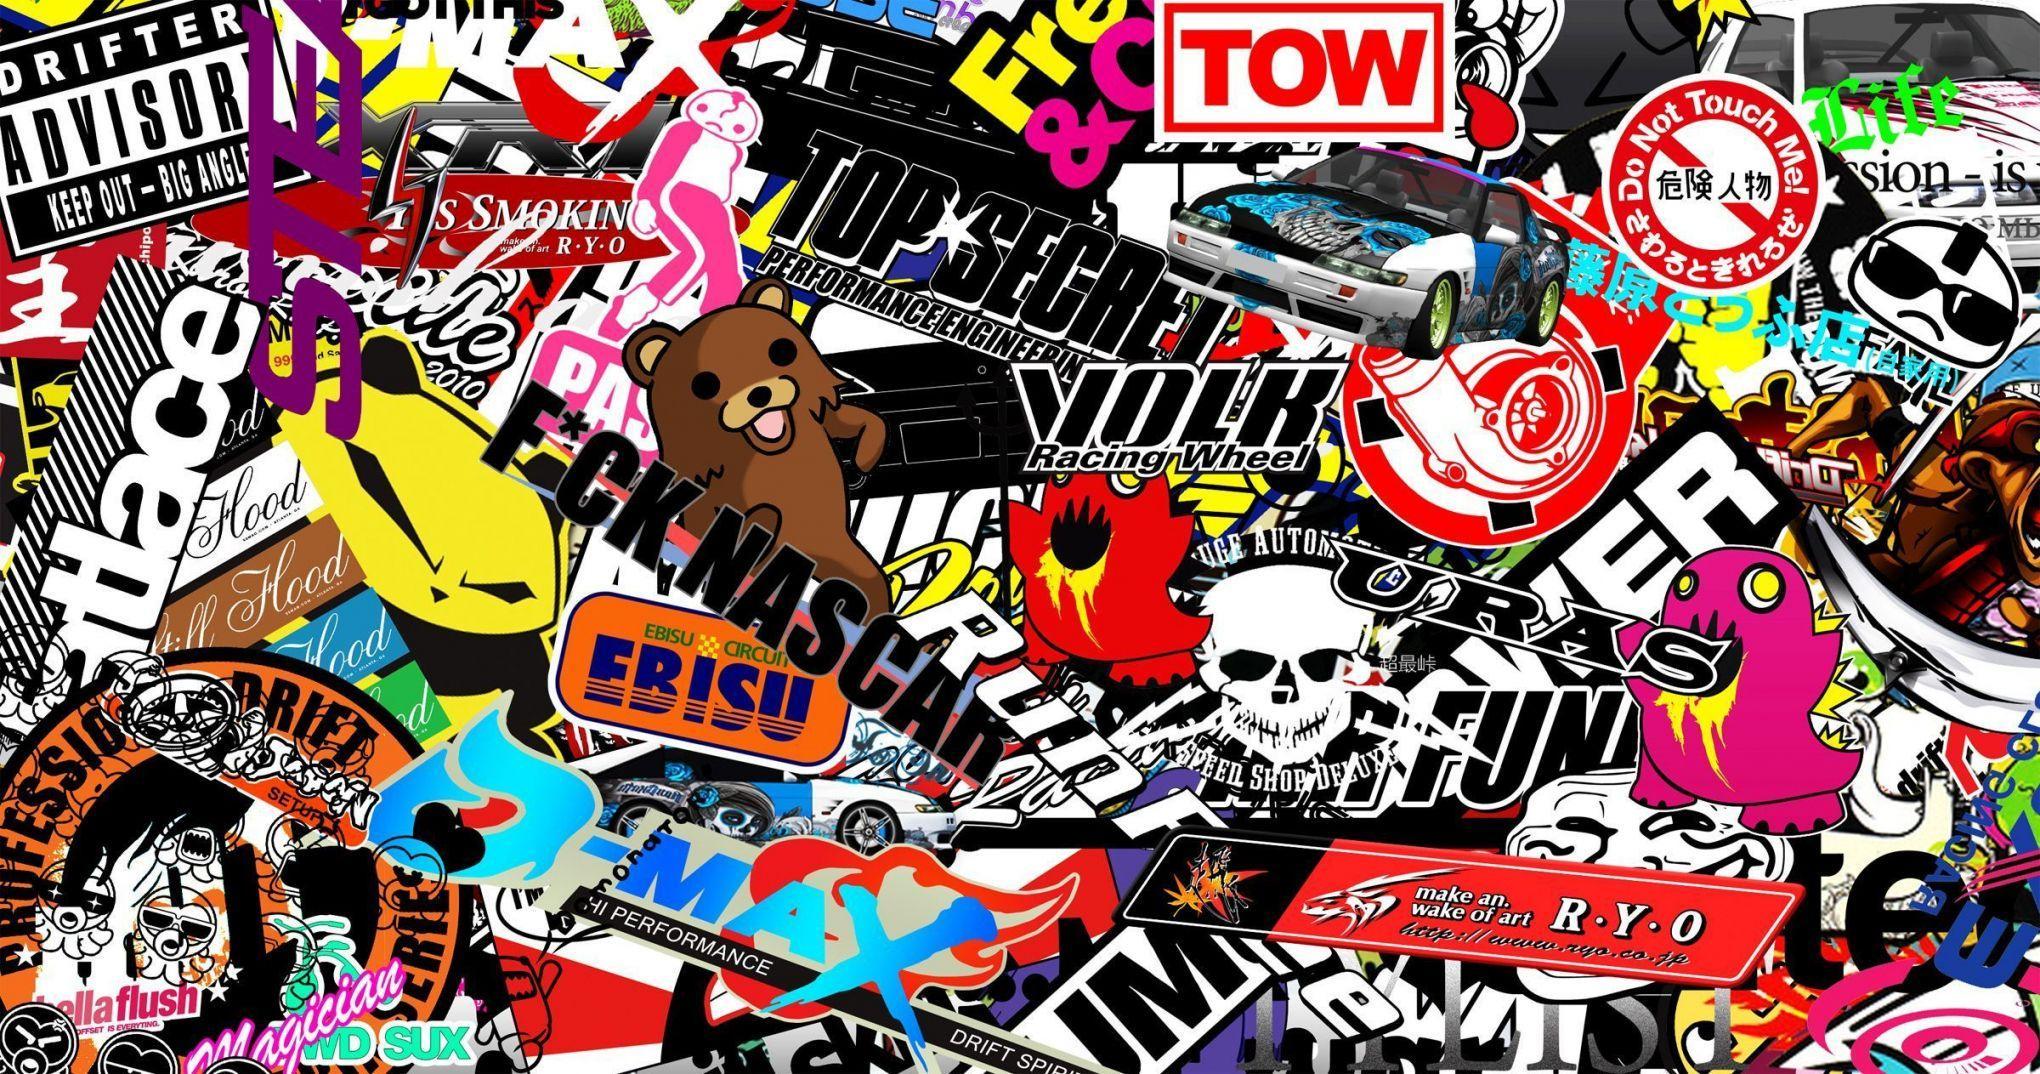 Jdm sticker wallpapers group 62 sticker wallpaper aslania com